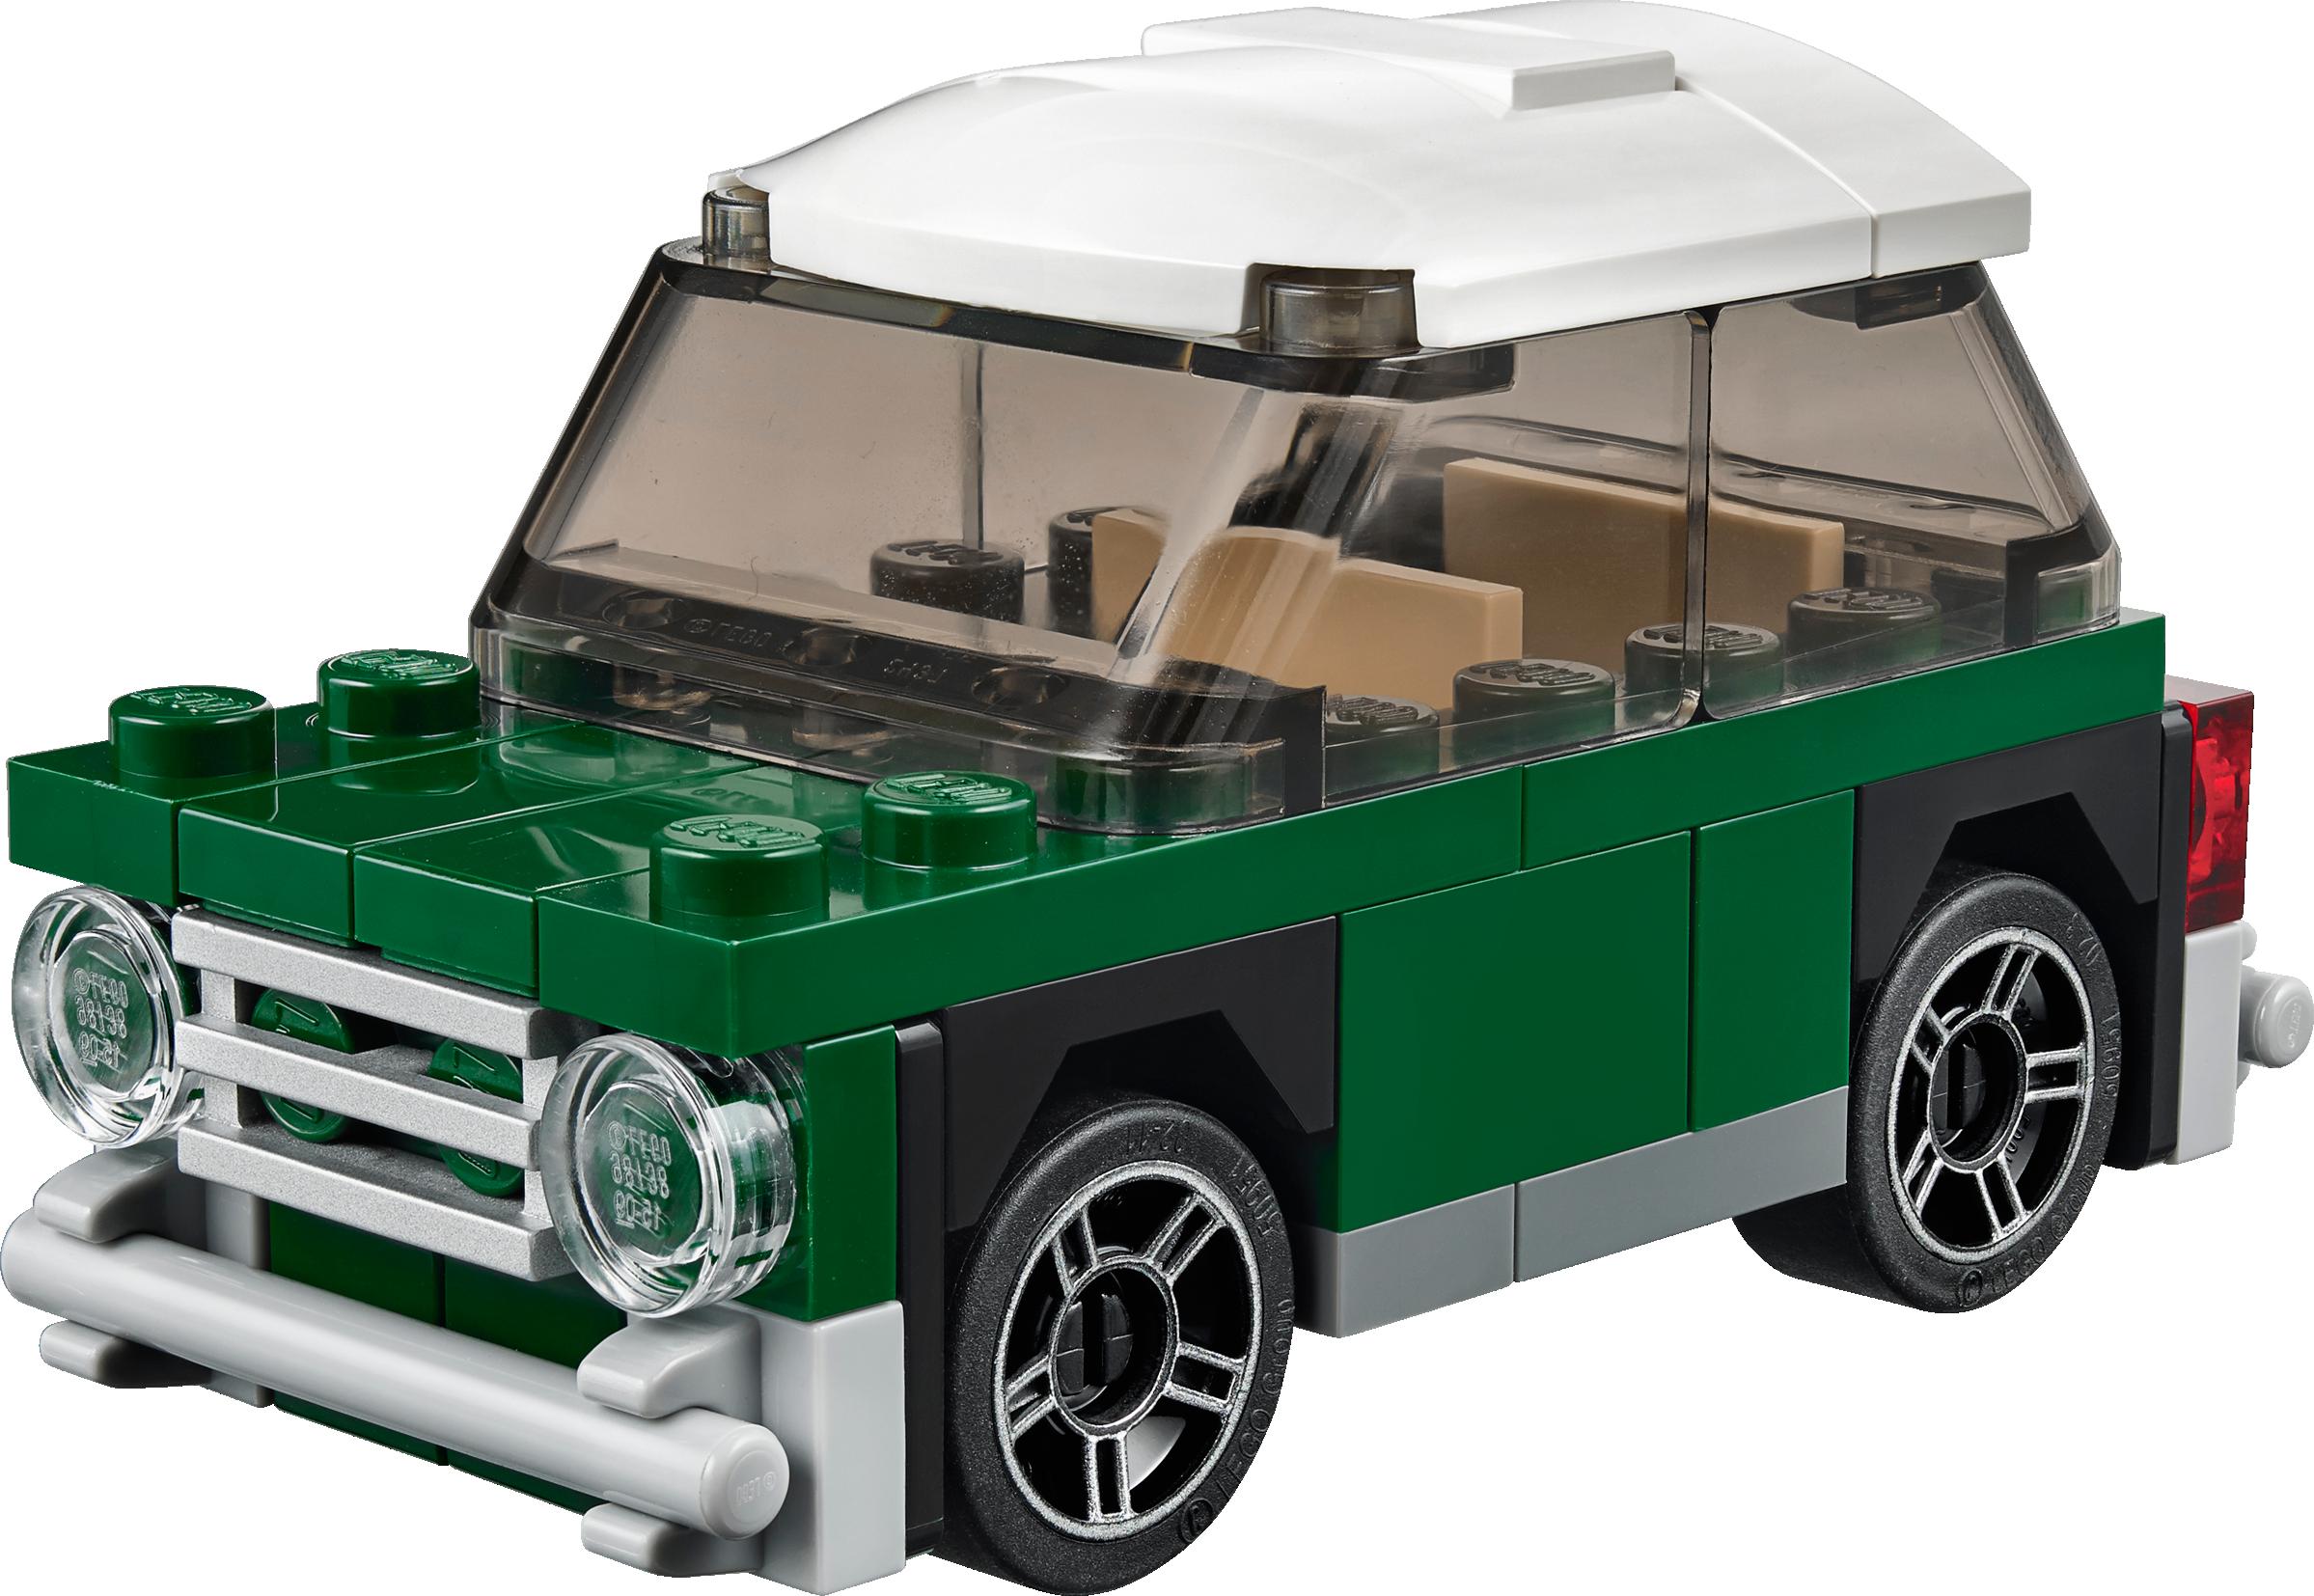 MINI Cooper Mini Model